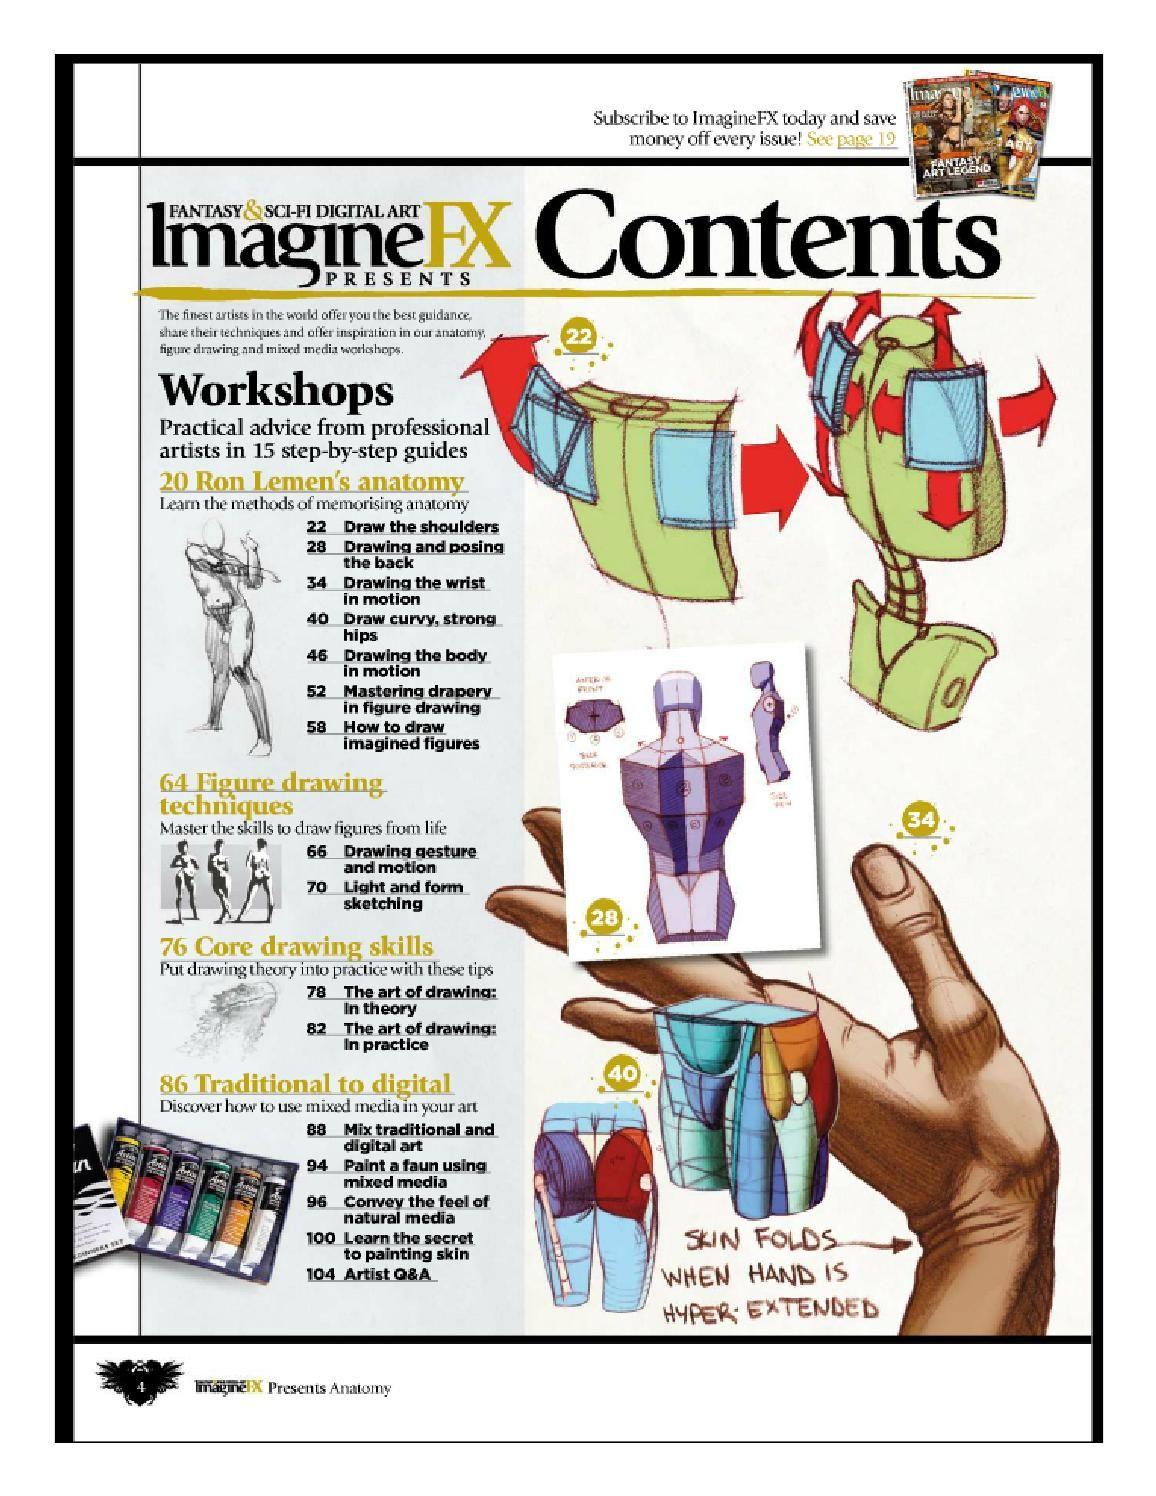 Imaginefx how to draw and paint anatomy vol 2 | Anatomía, Arte ...